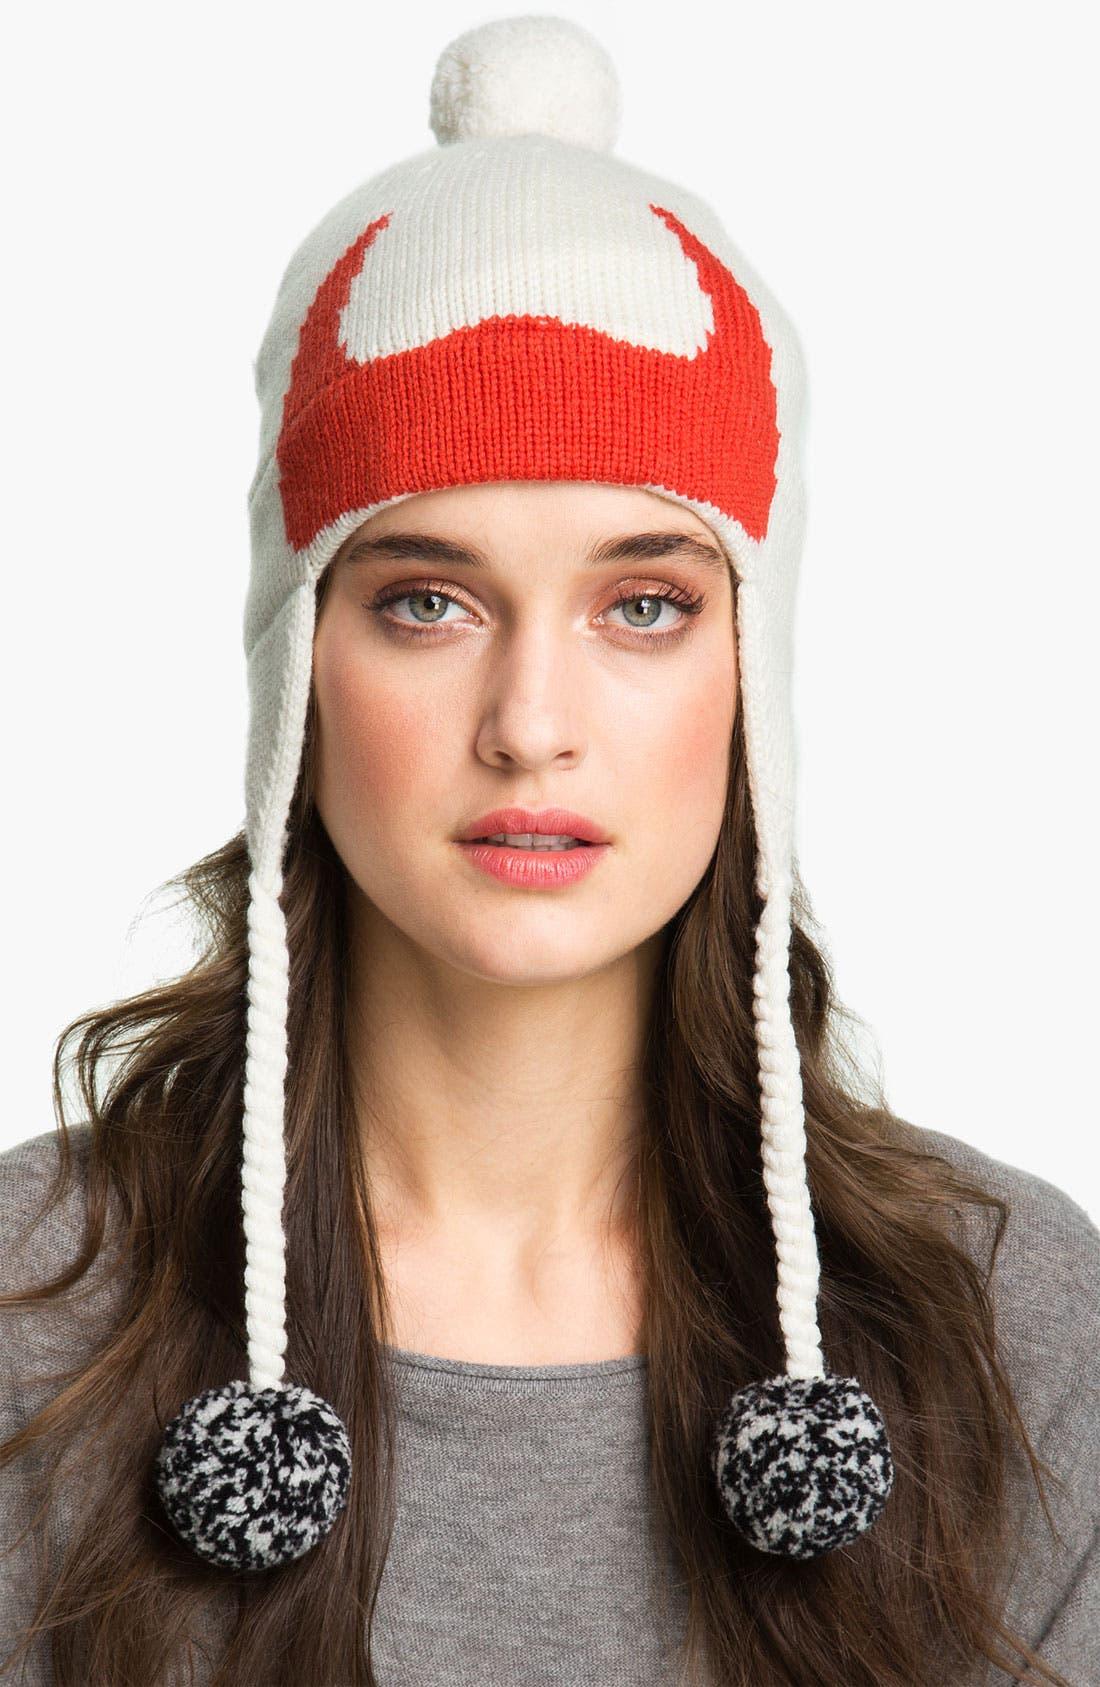 Alternate Image 1 Selected - kate spade new york 'big apple' merino wool ski hat